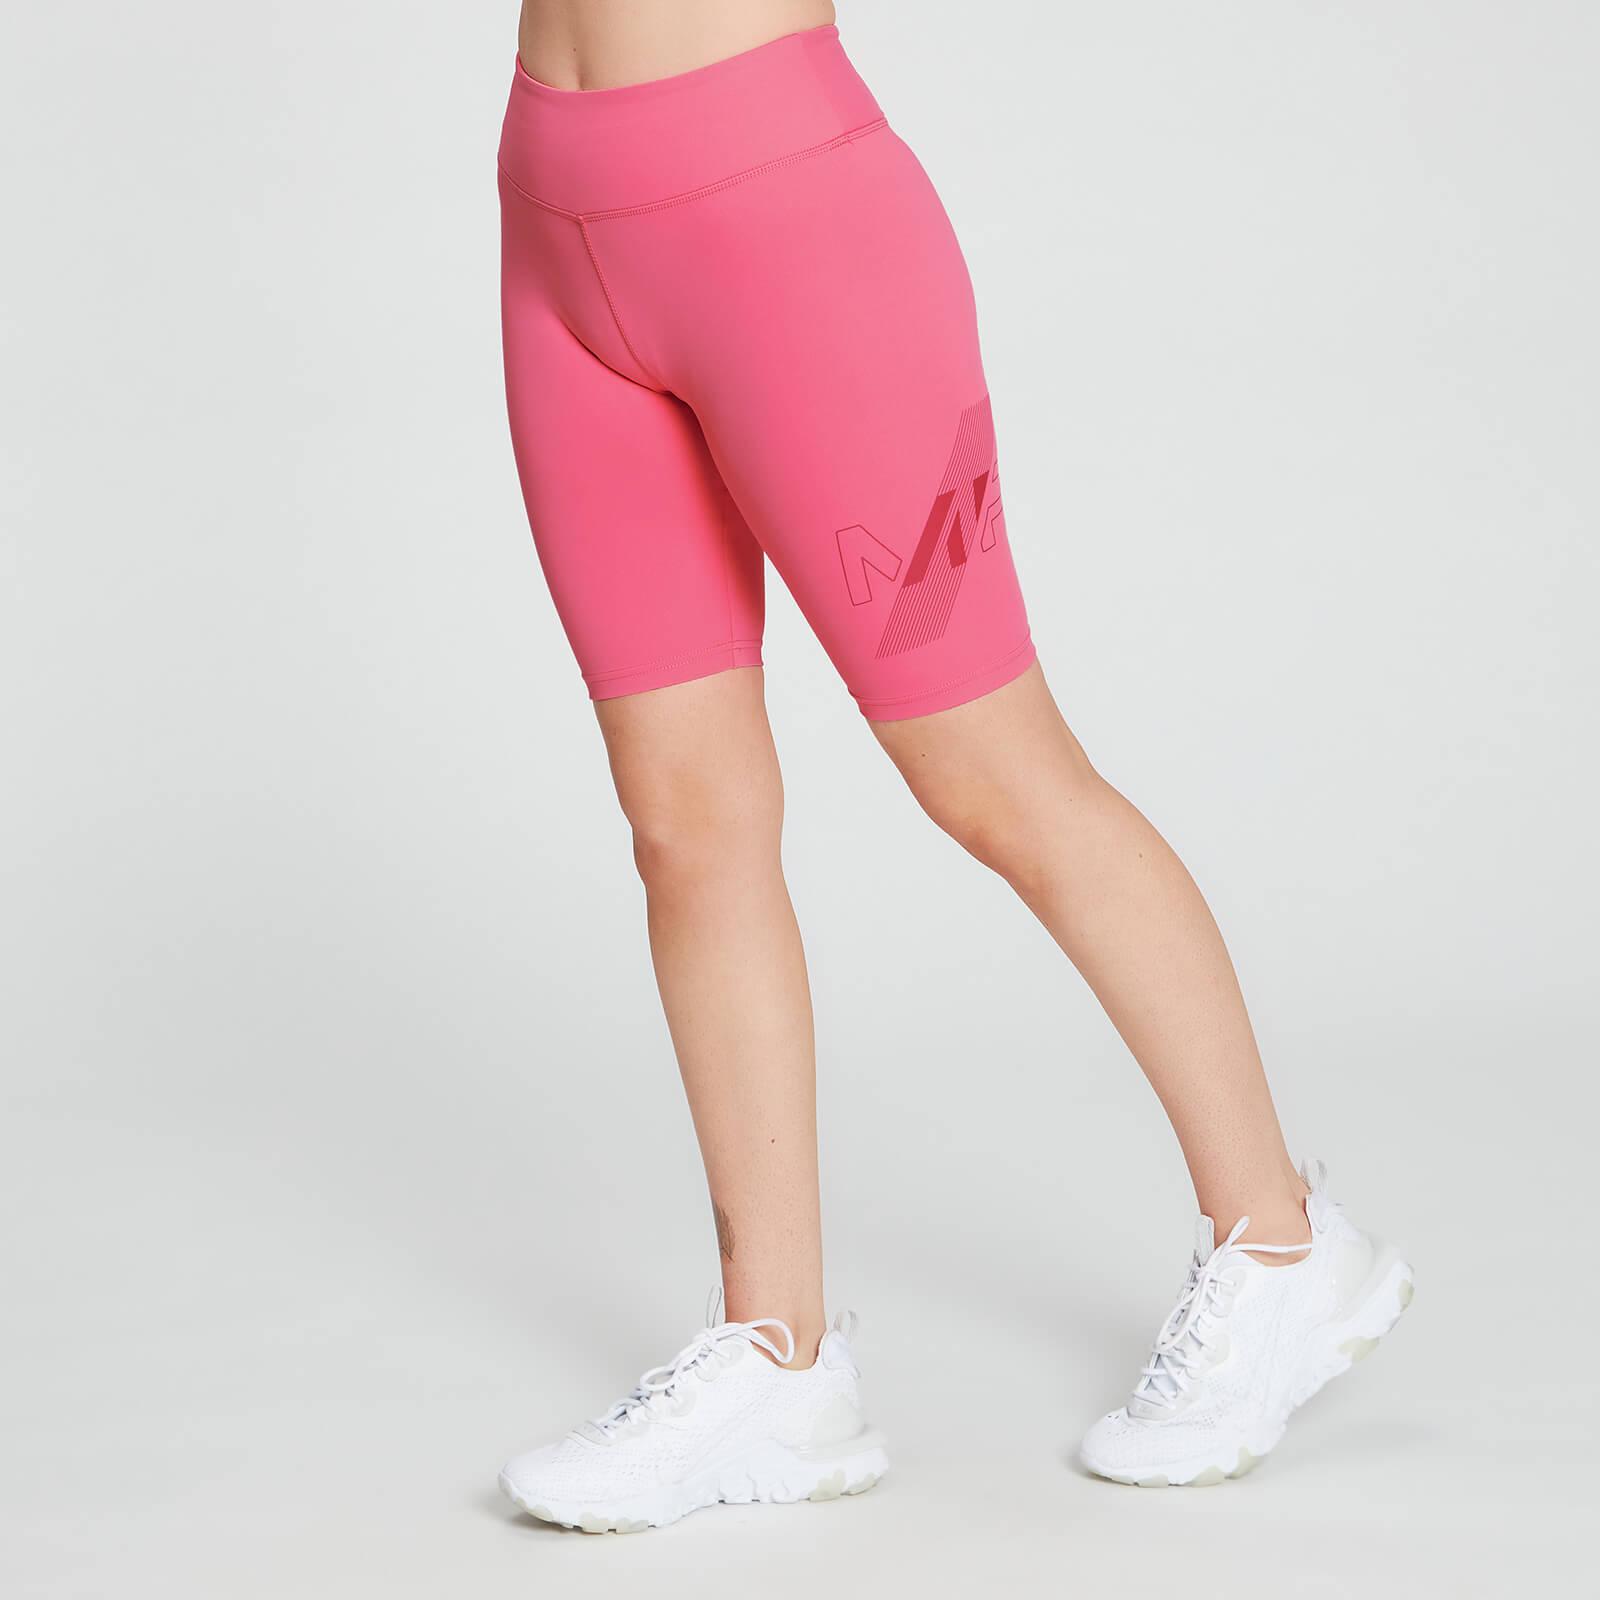 Купить MP Women's Limited Edition Impact Cycling Shorts - Pink - XXL, Myprotein International